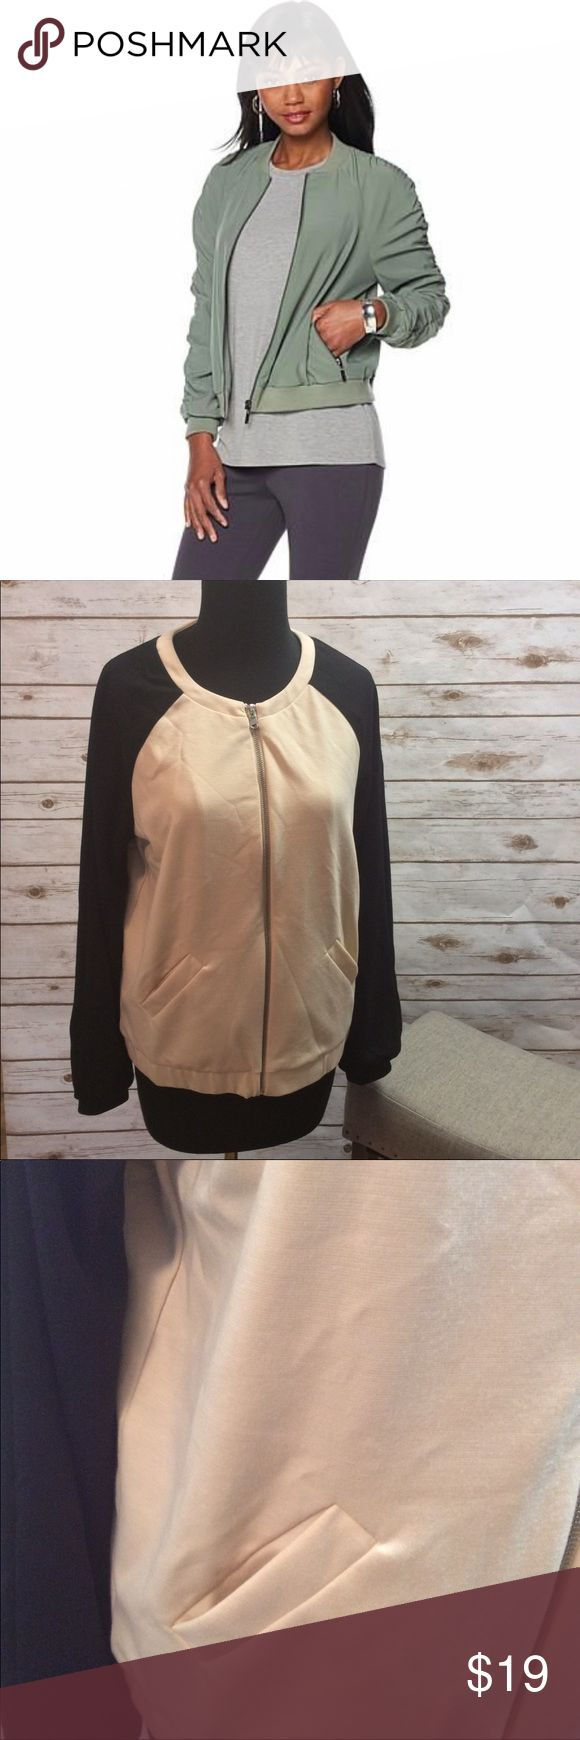 Selling this ✨Serena Williams✨ NWOT Bomber Jacket Size M on Poshmark! My username is: _maylove_. #shopmycloset #poshmark #fashion #shopping #style #forsale #Serena Williams #Jackets & Blazers